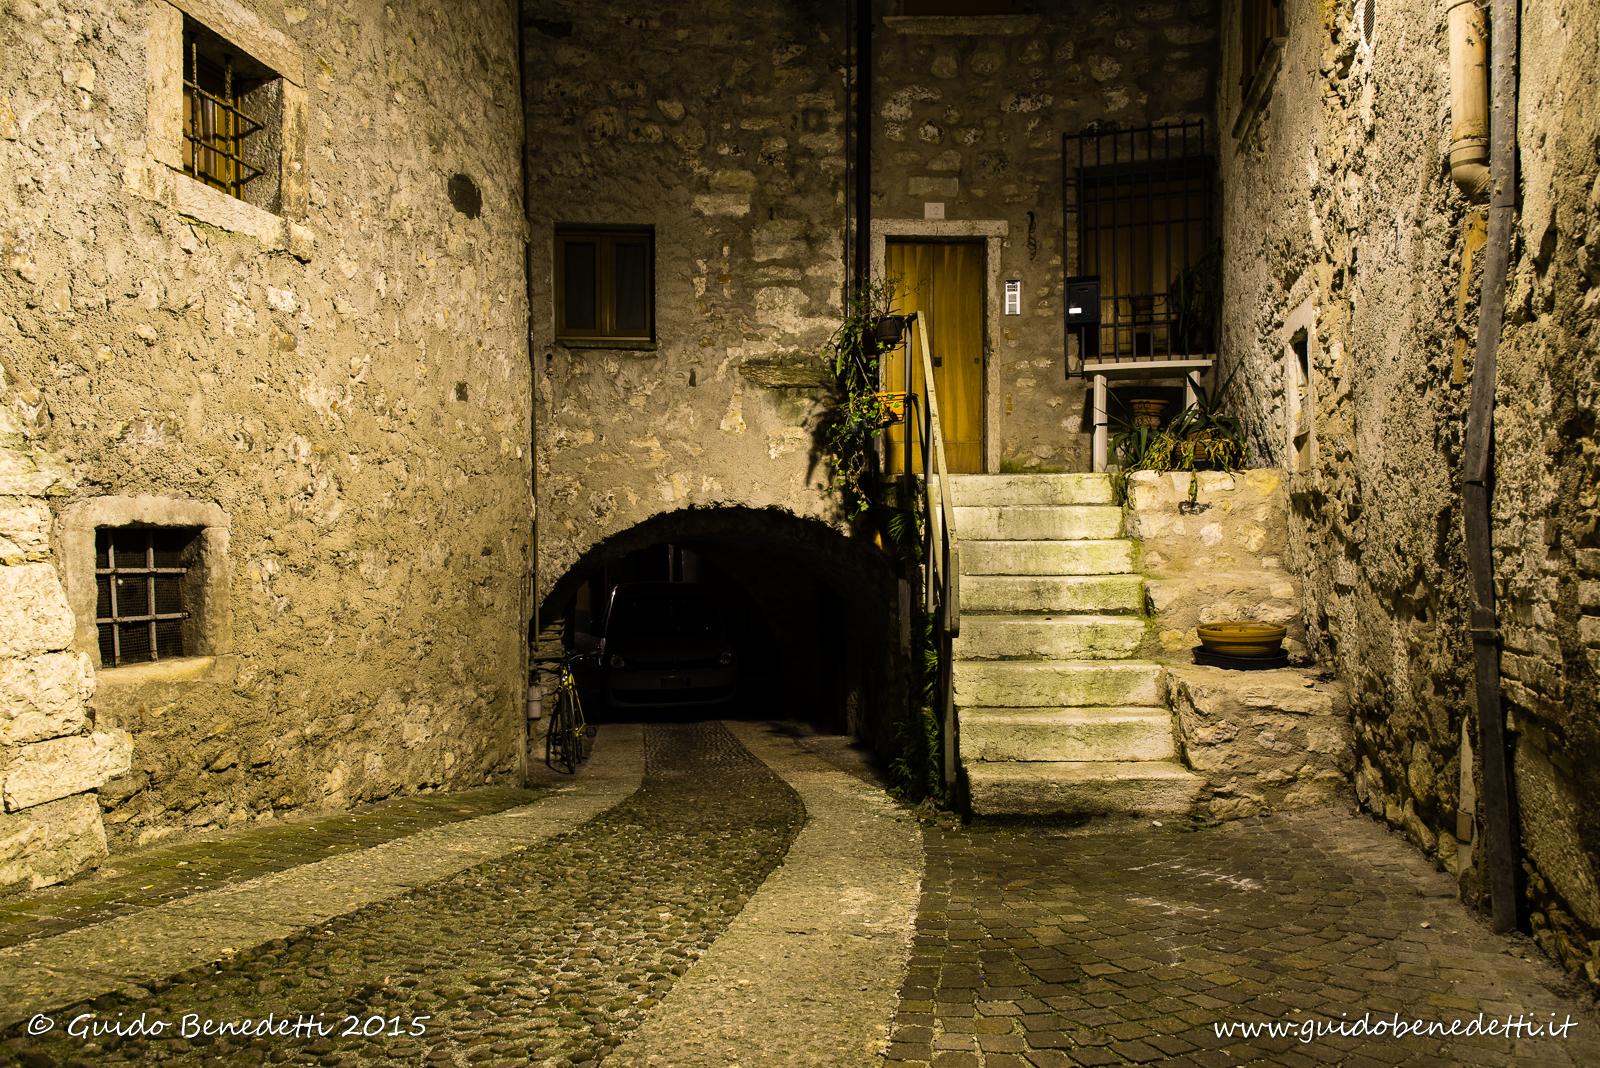 Scorcio arcense by night